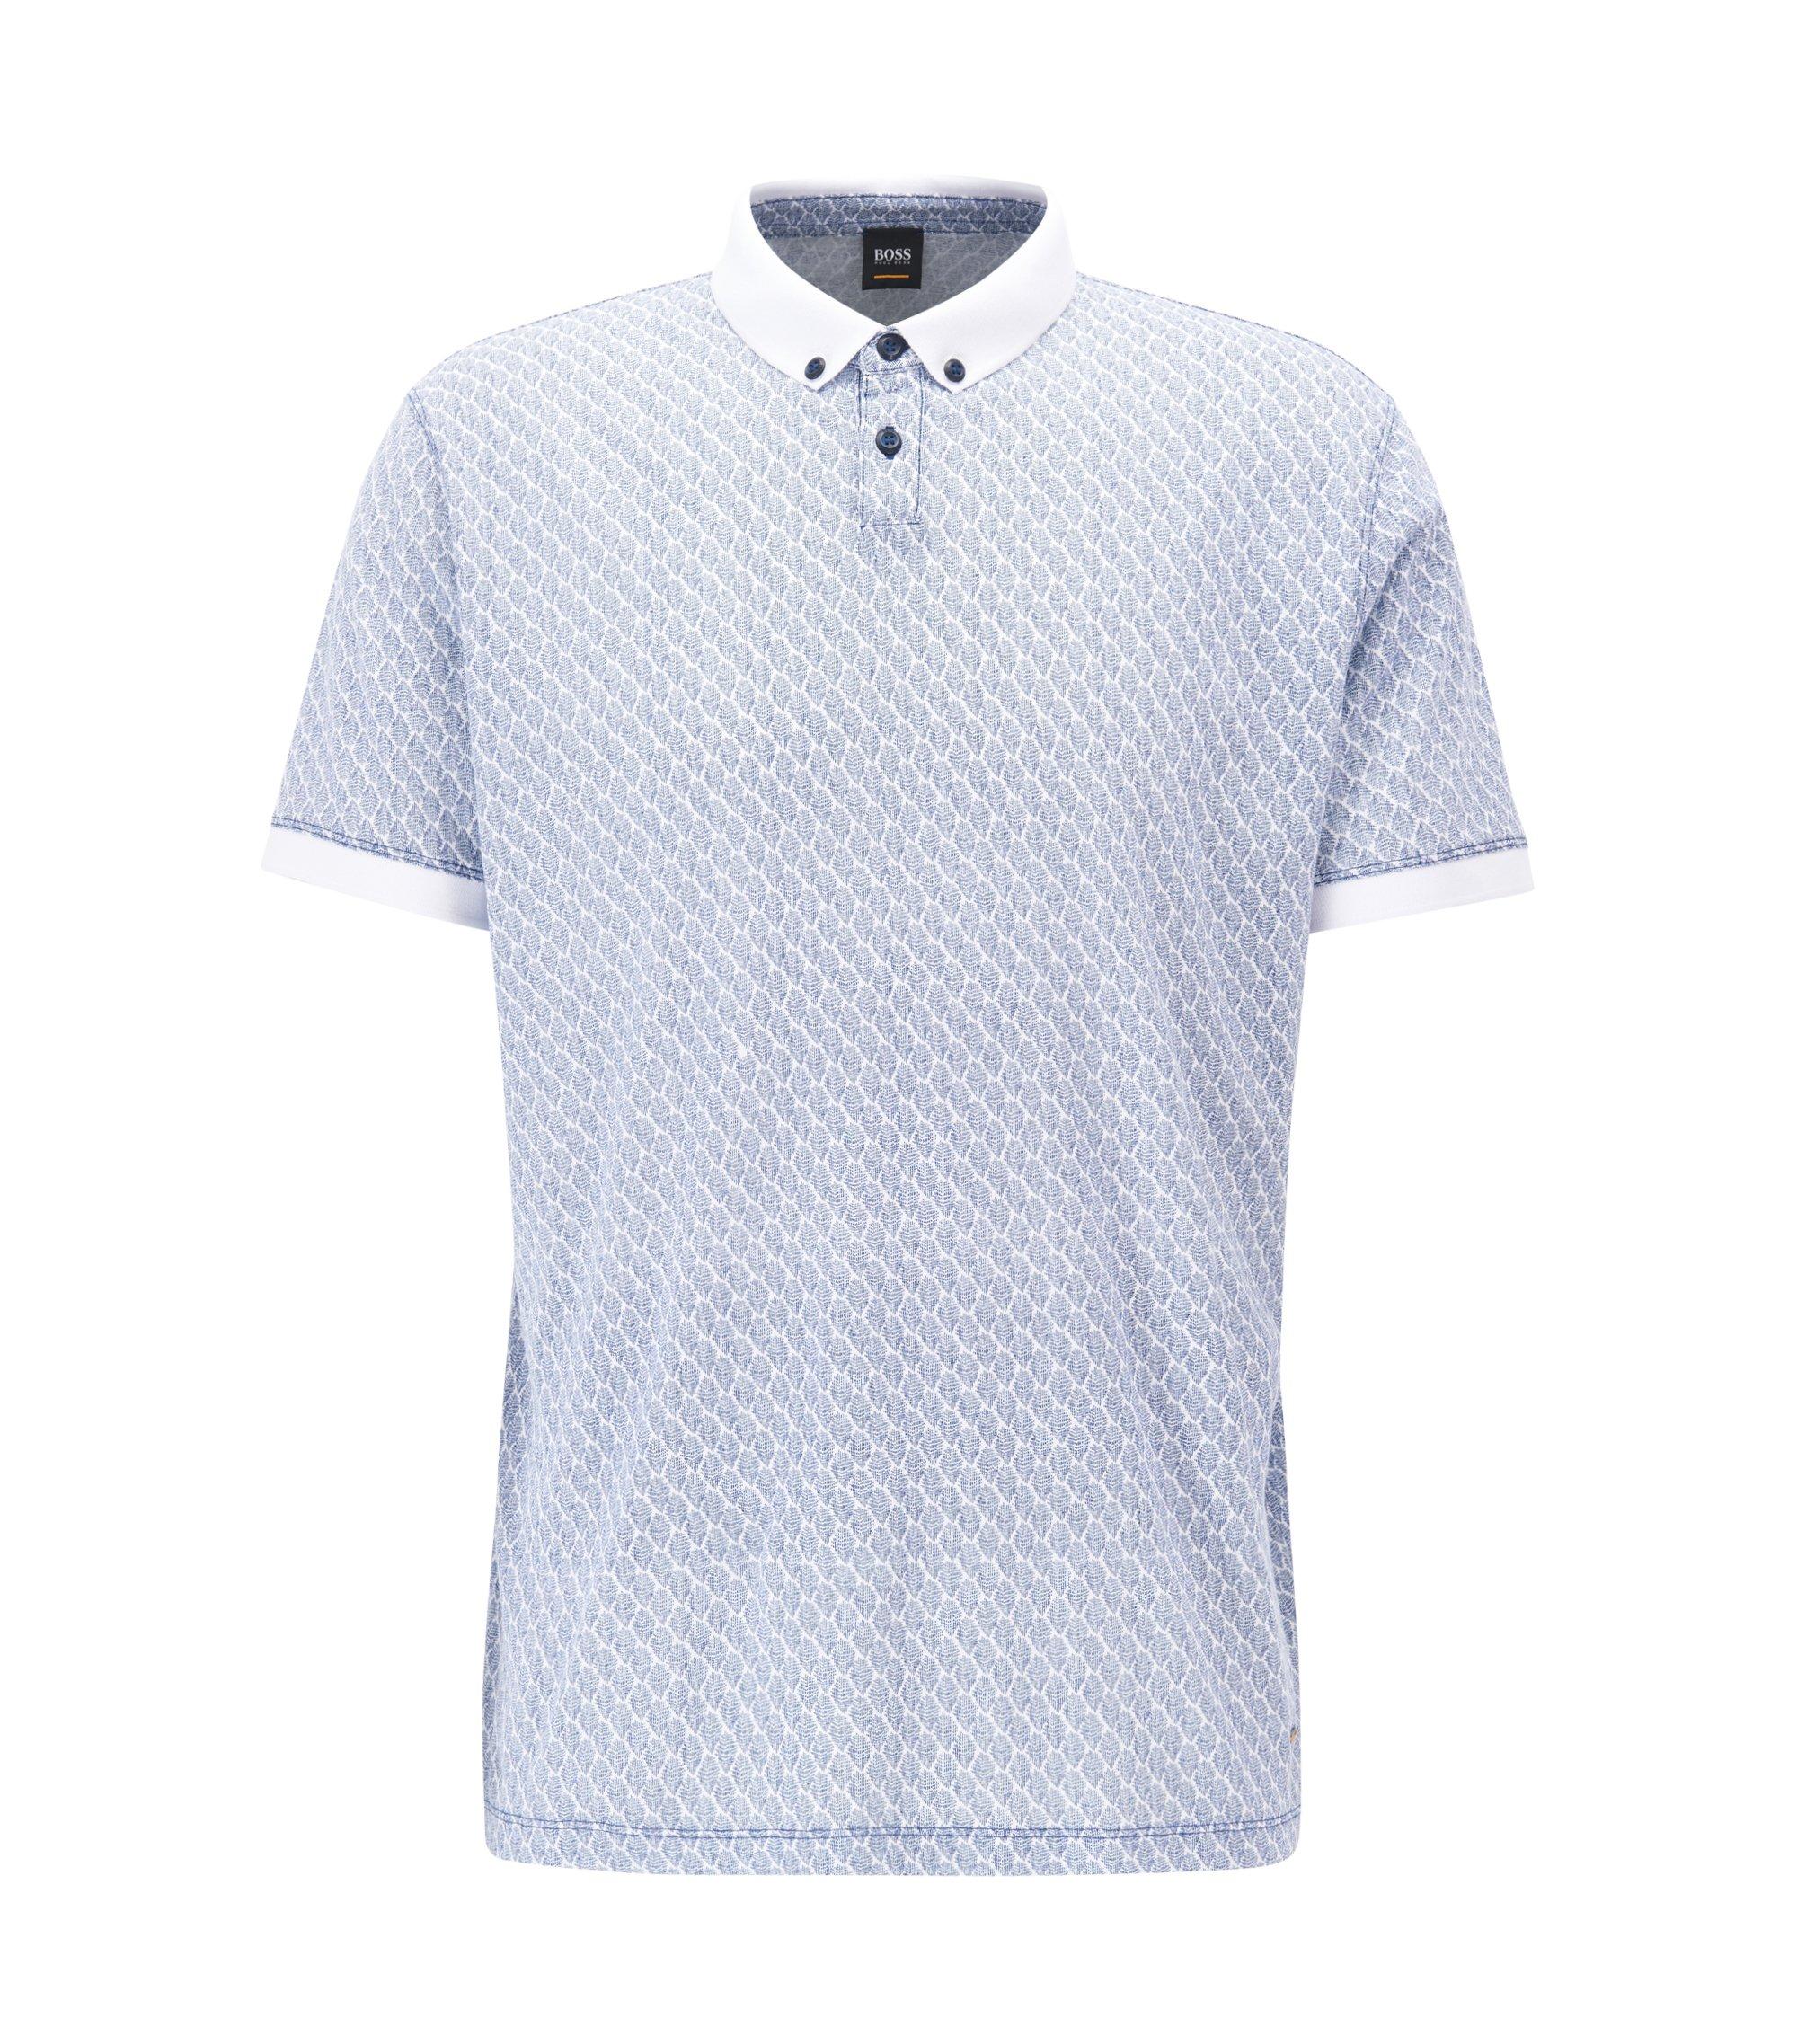 Polo Relaxed Fit en coton à motif, Bleu vif